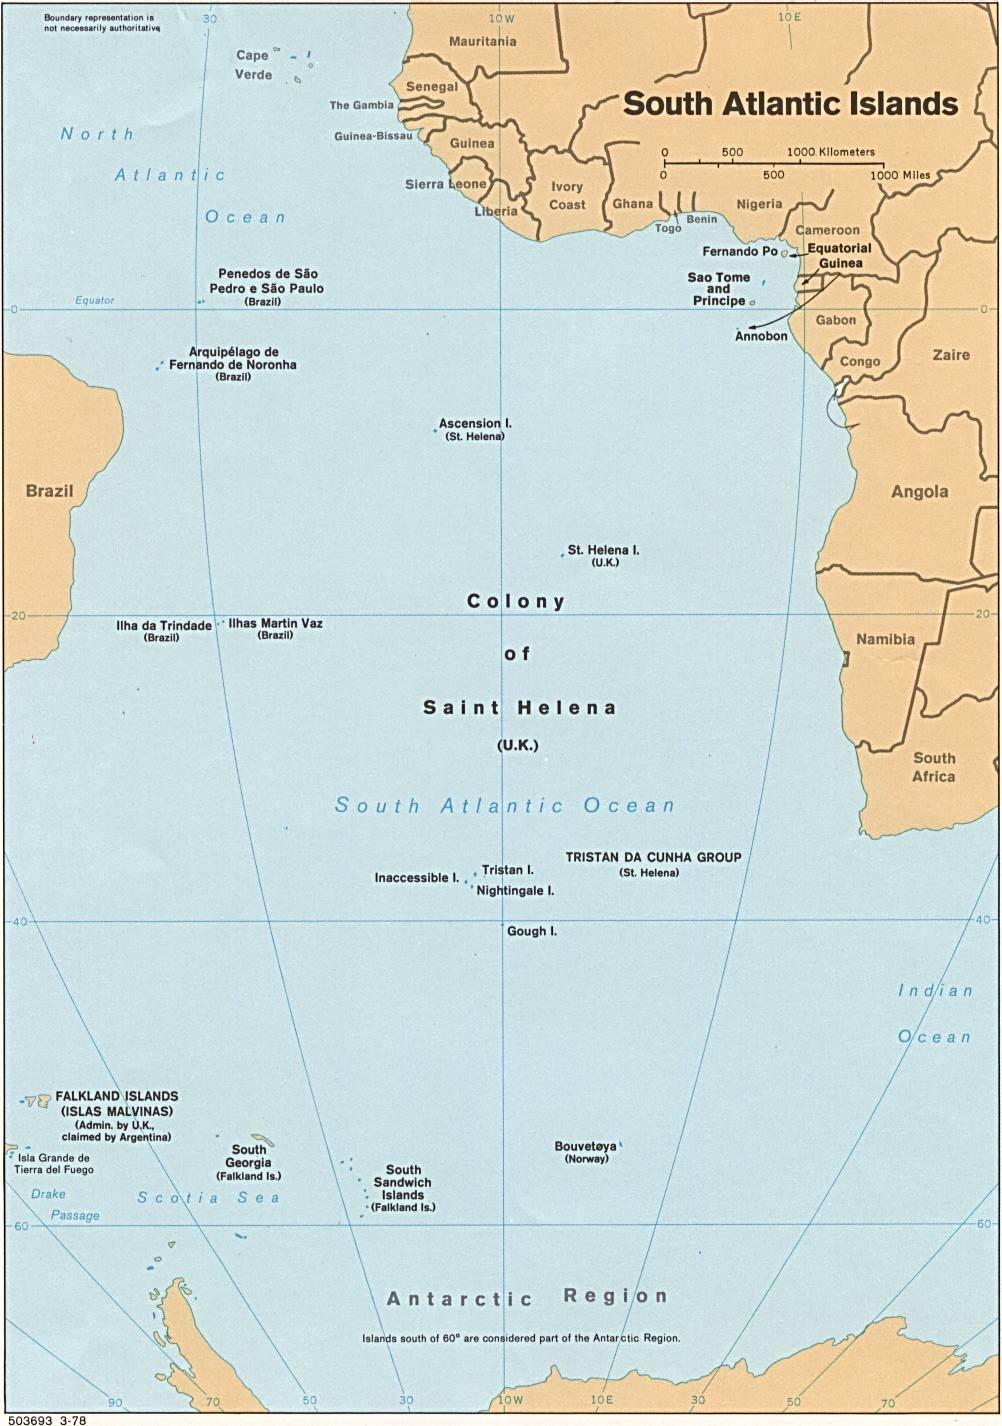 Reisenett maps of polar regions and oceans south atlantic ocean islands gumiabroncs Choice Image